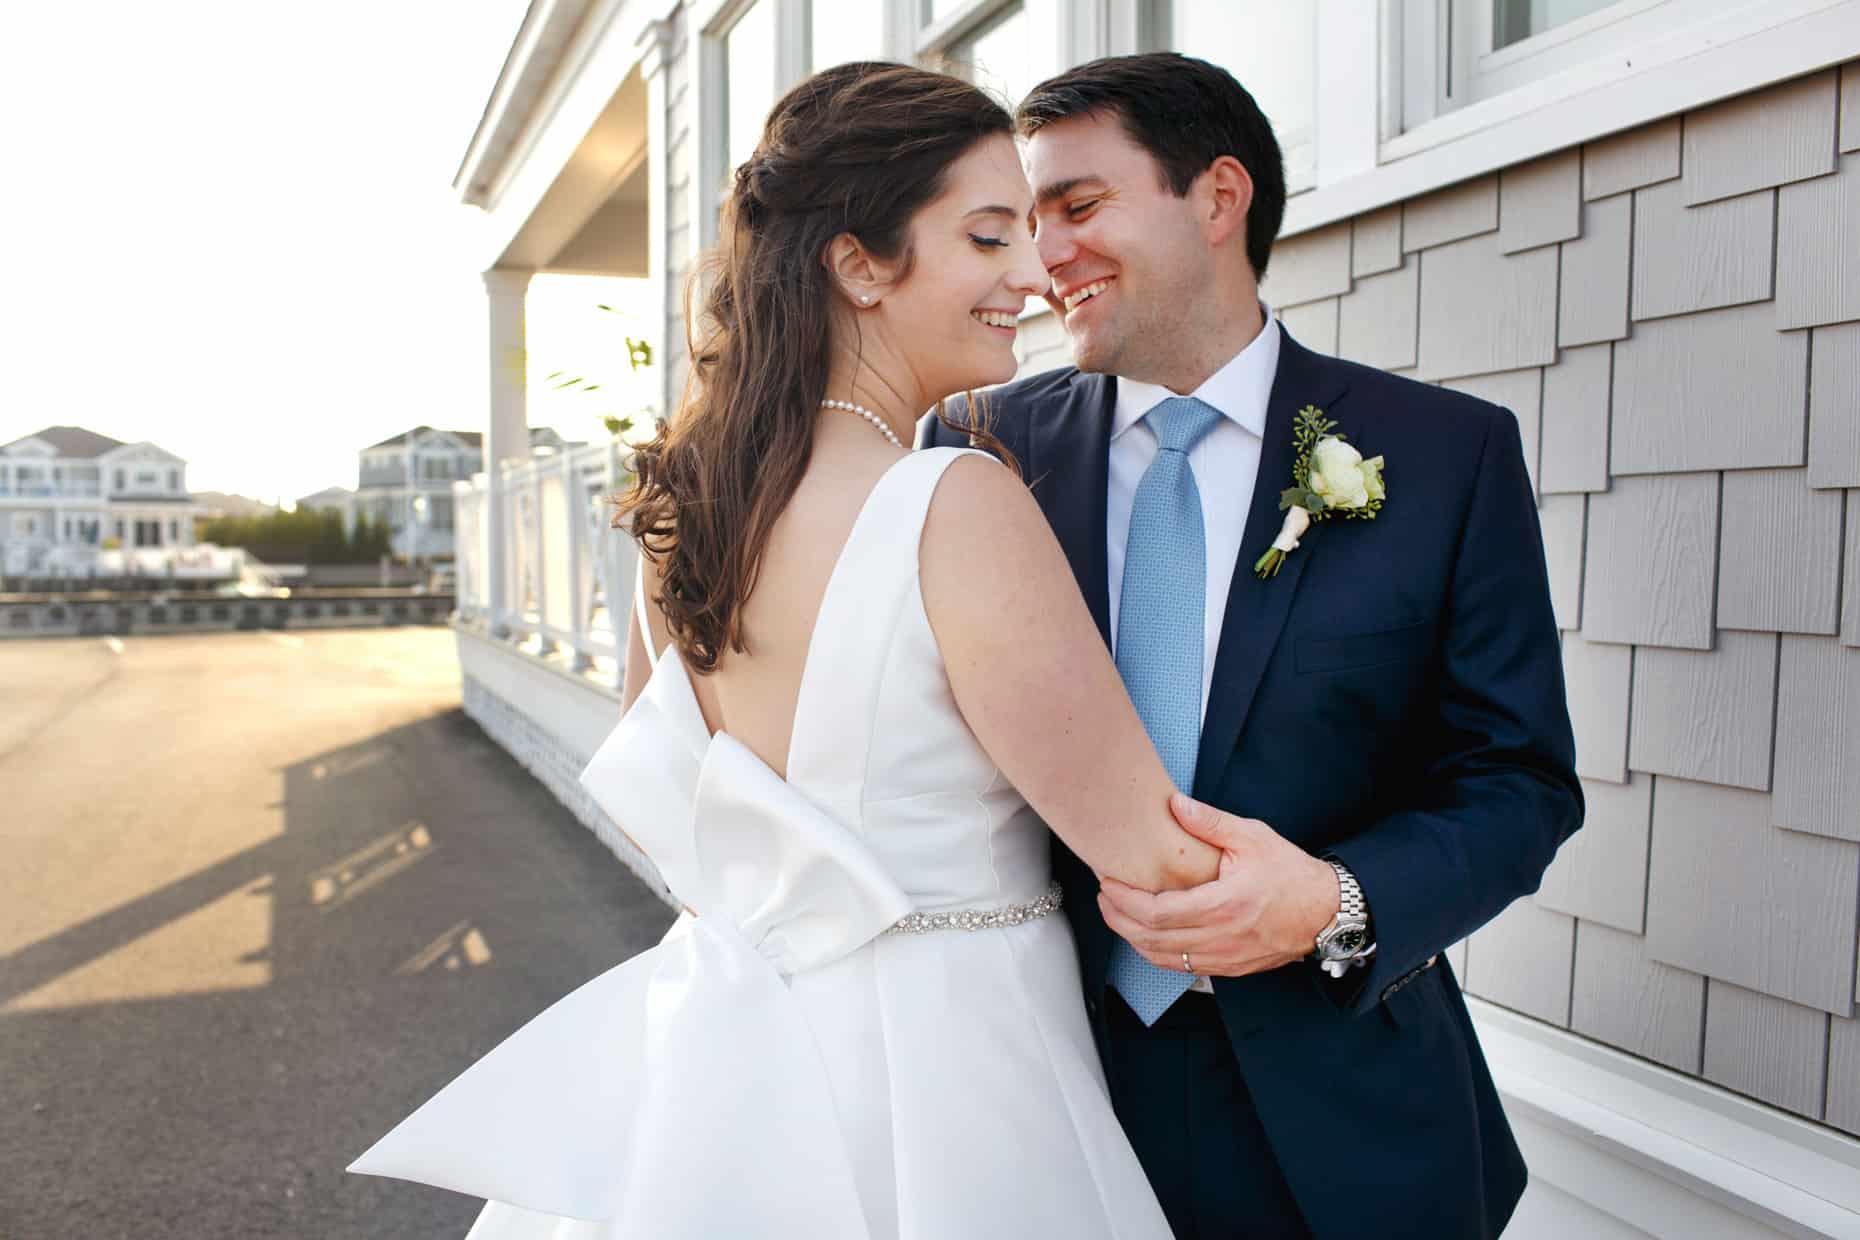 Stone Harbor Wedding Venues